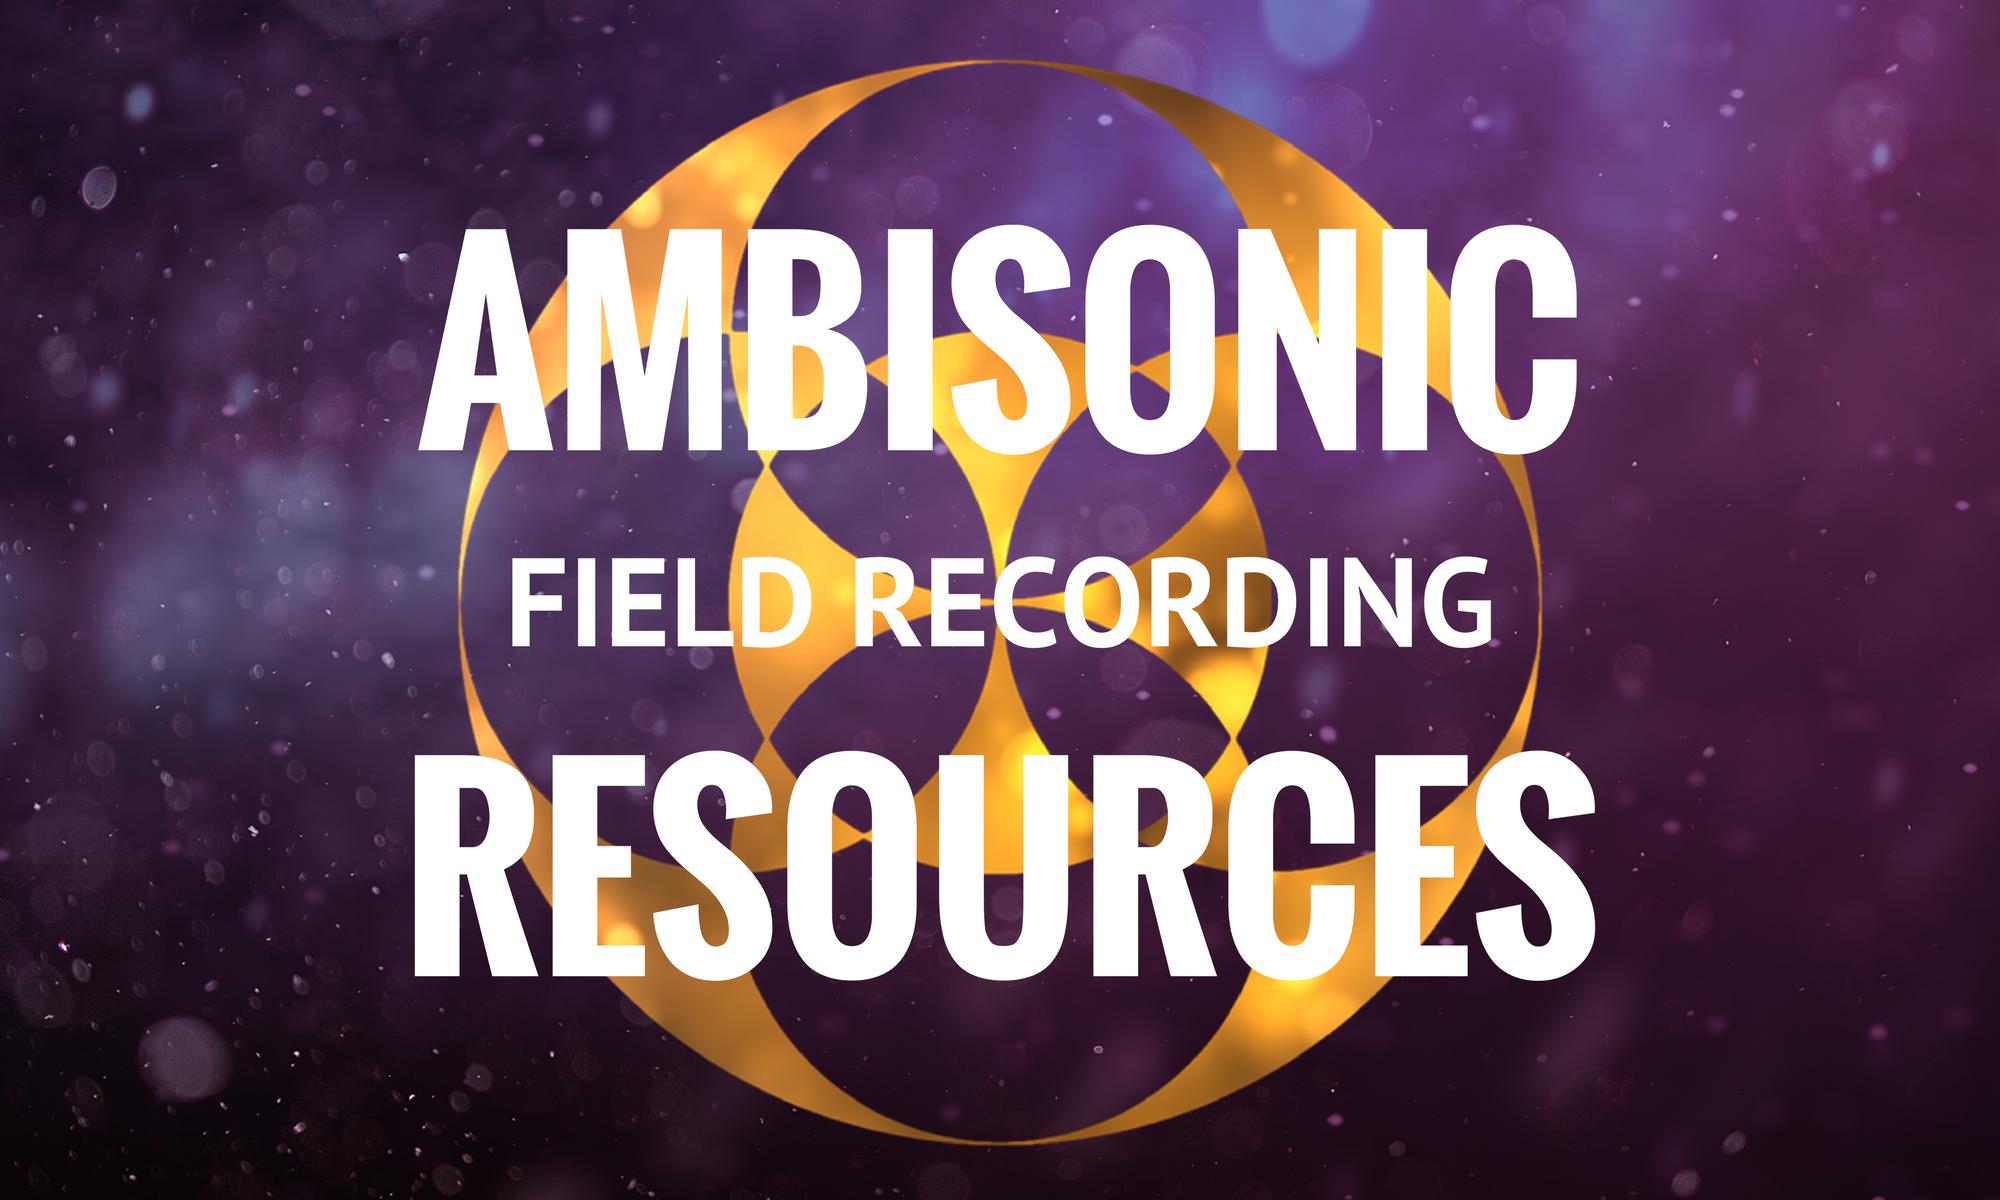 Ambisonics ambisonic field recording resources | creative field recording